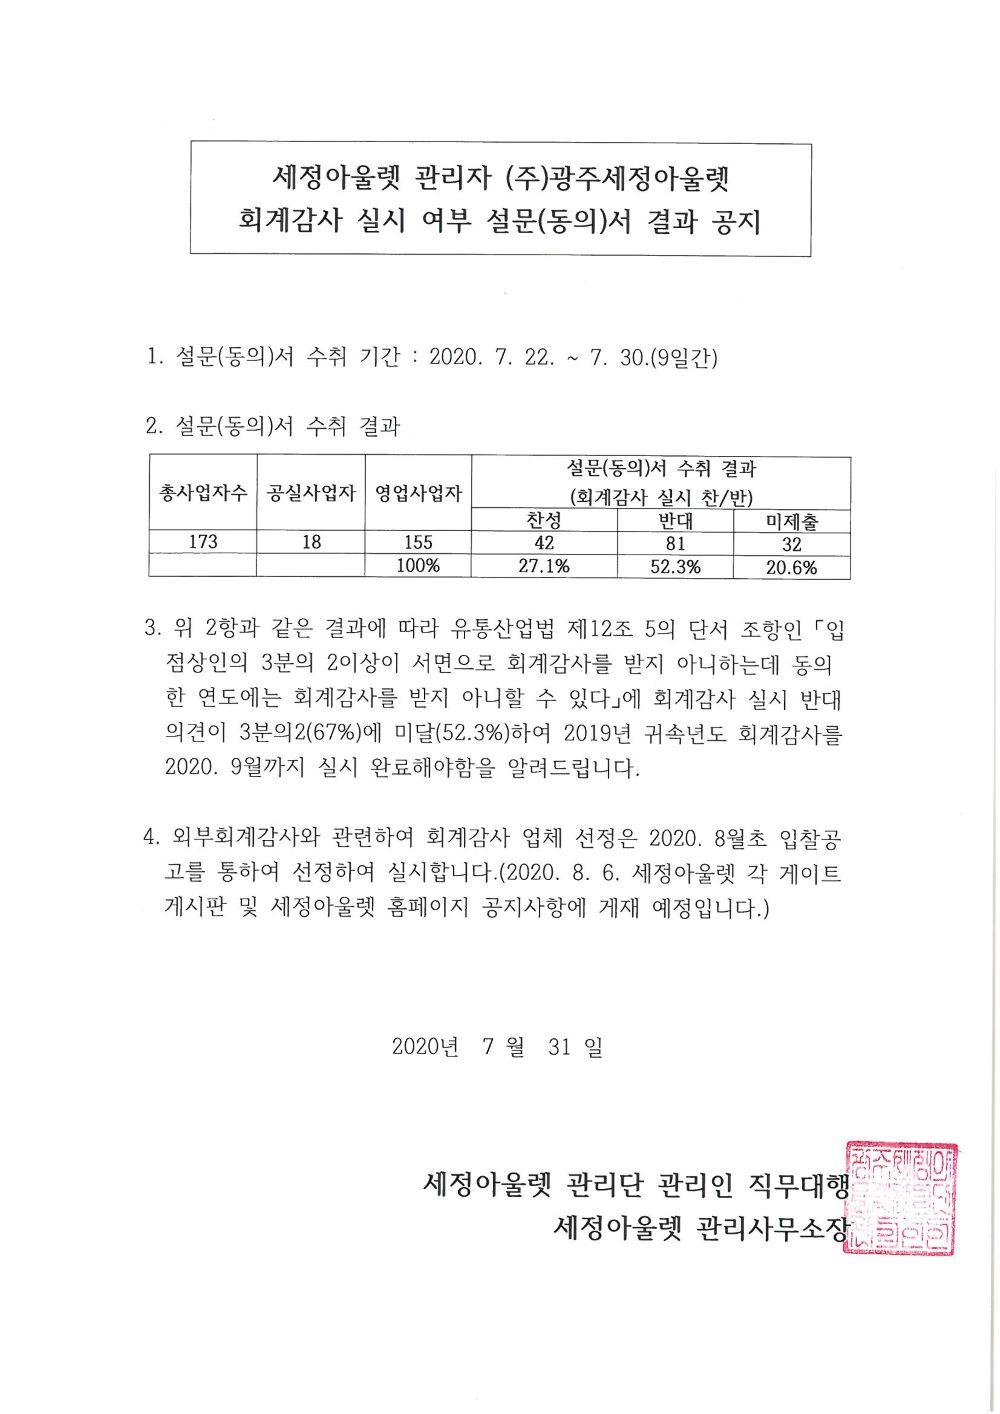 http://www.sejung-outlet.co.kr/bs/se2/imgup/1596172862공지(회계감사_실시여부).jpg